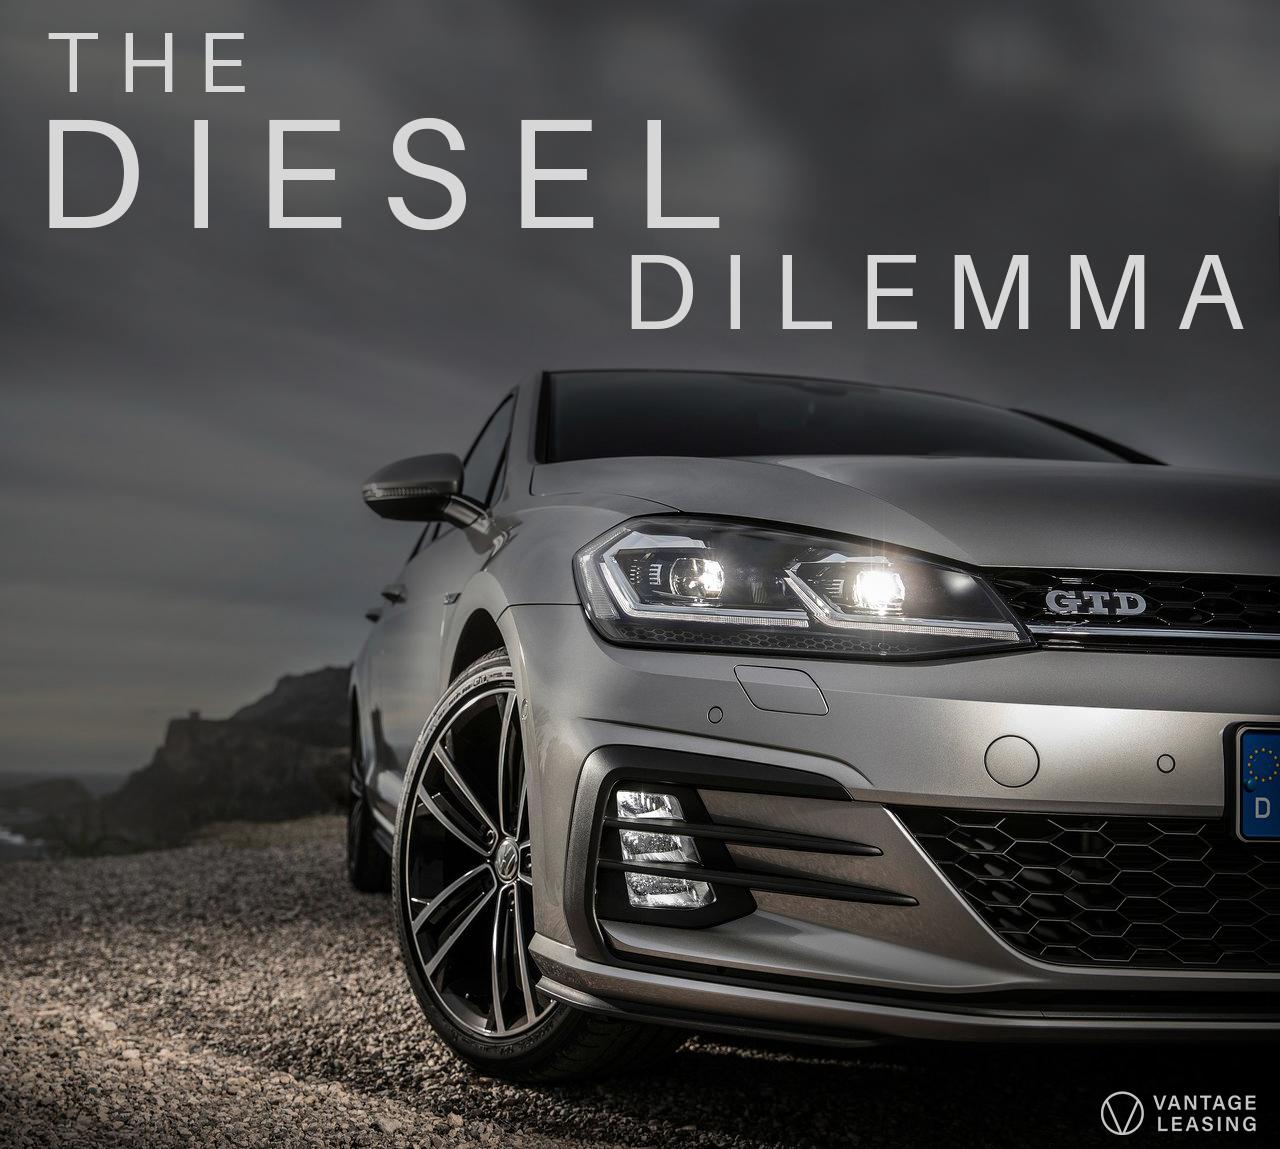 Car Leasing Study - The Diesel Dilemma